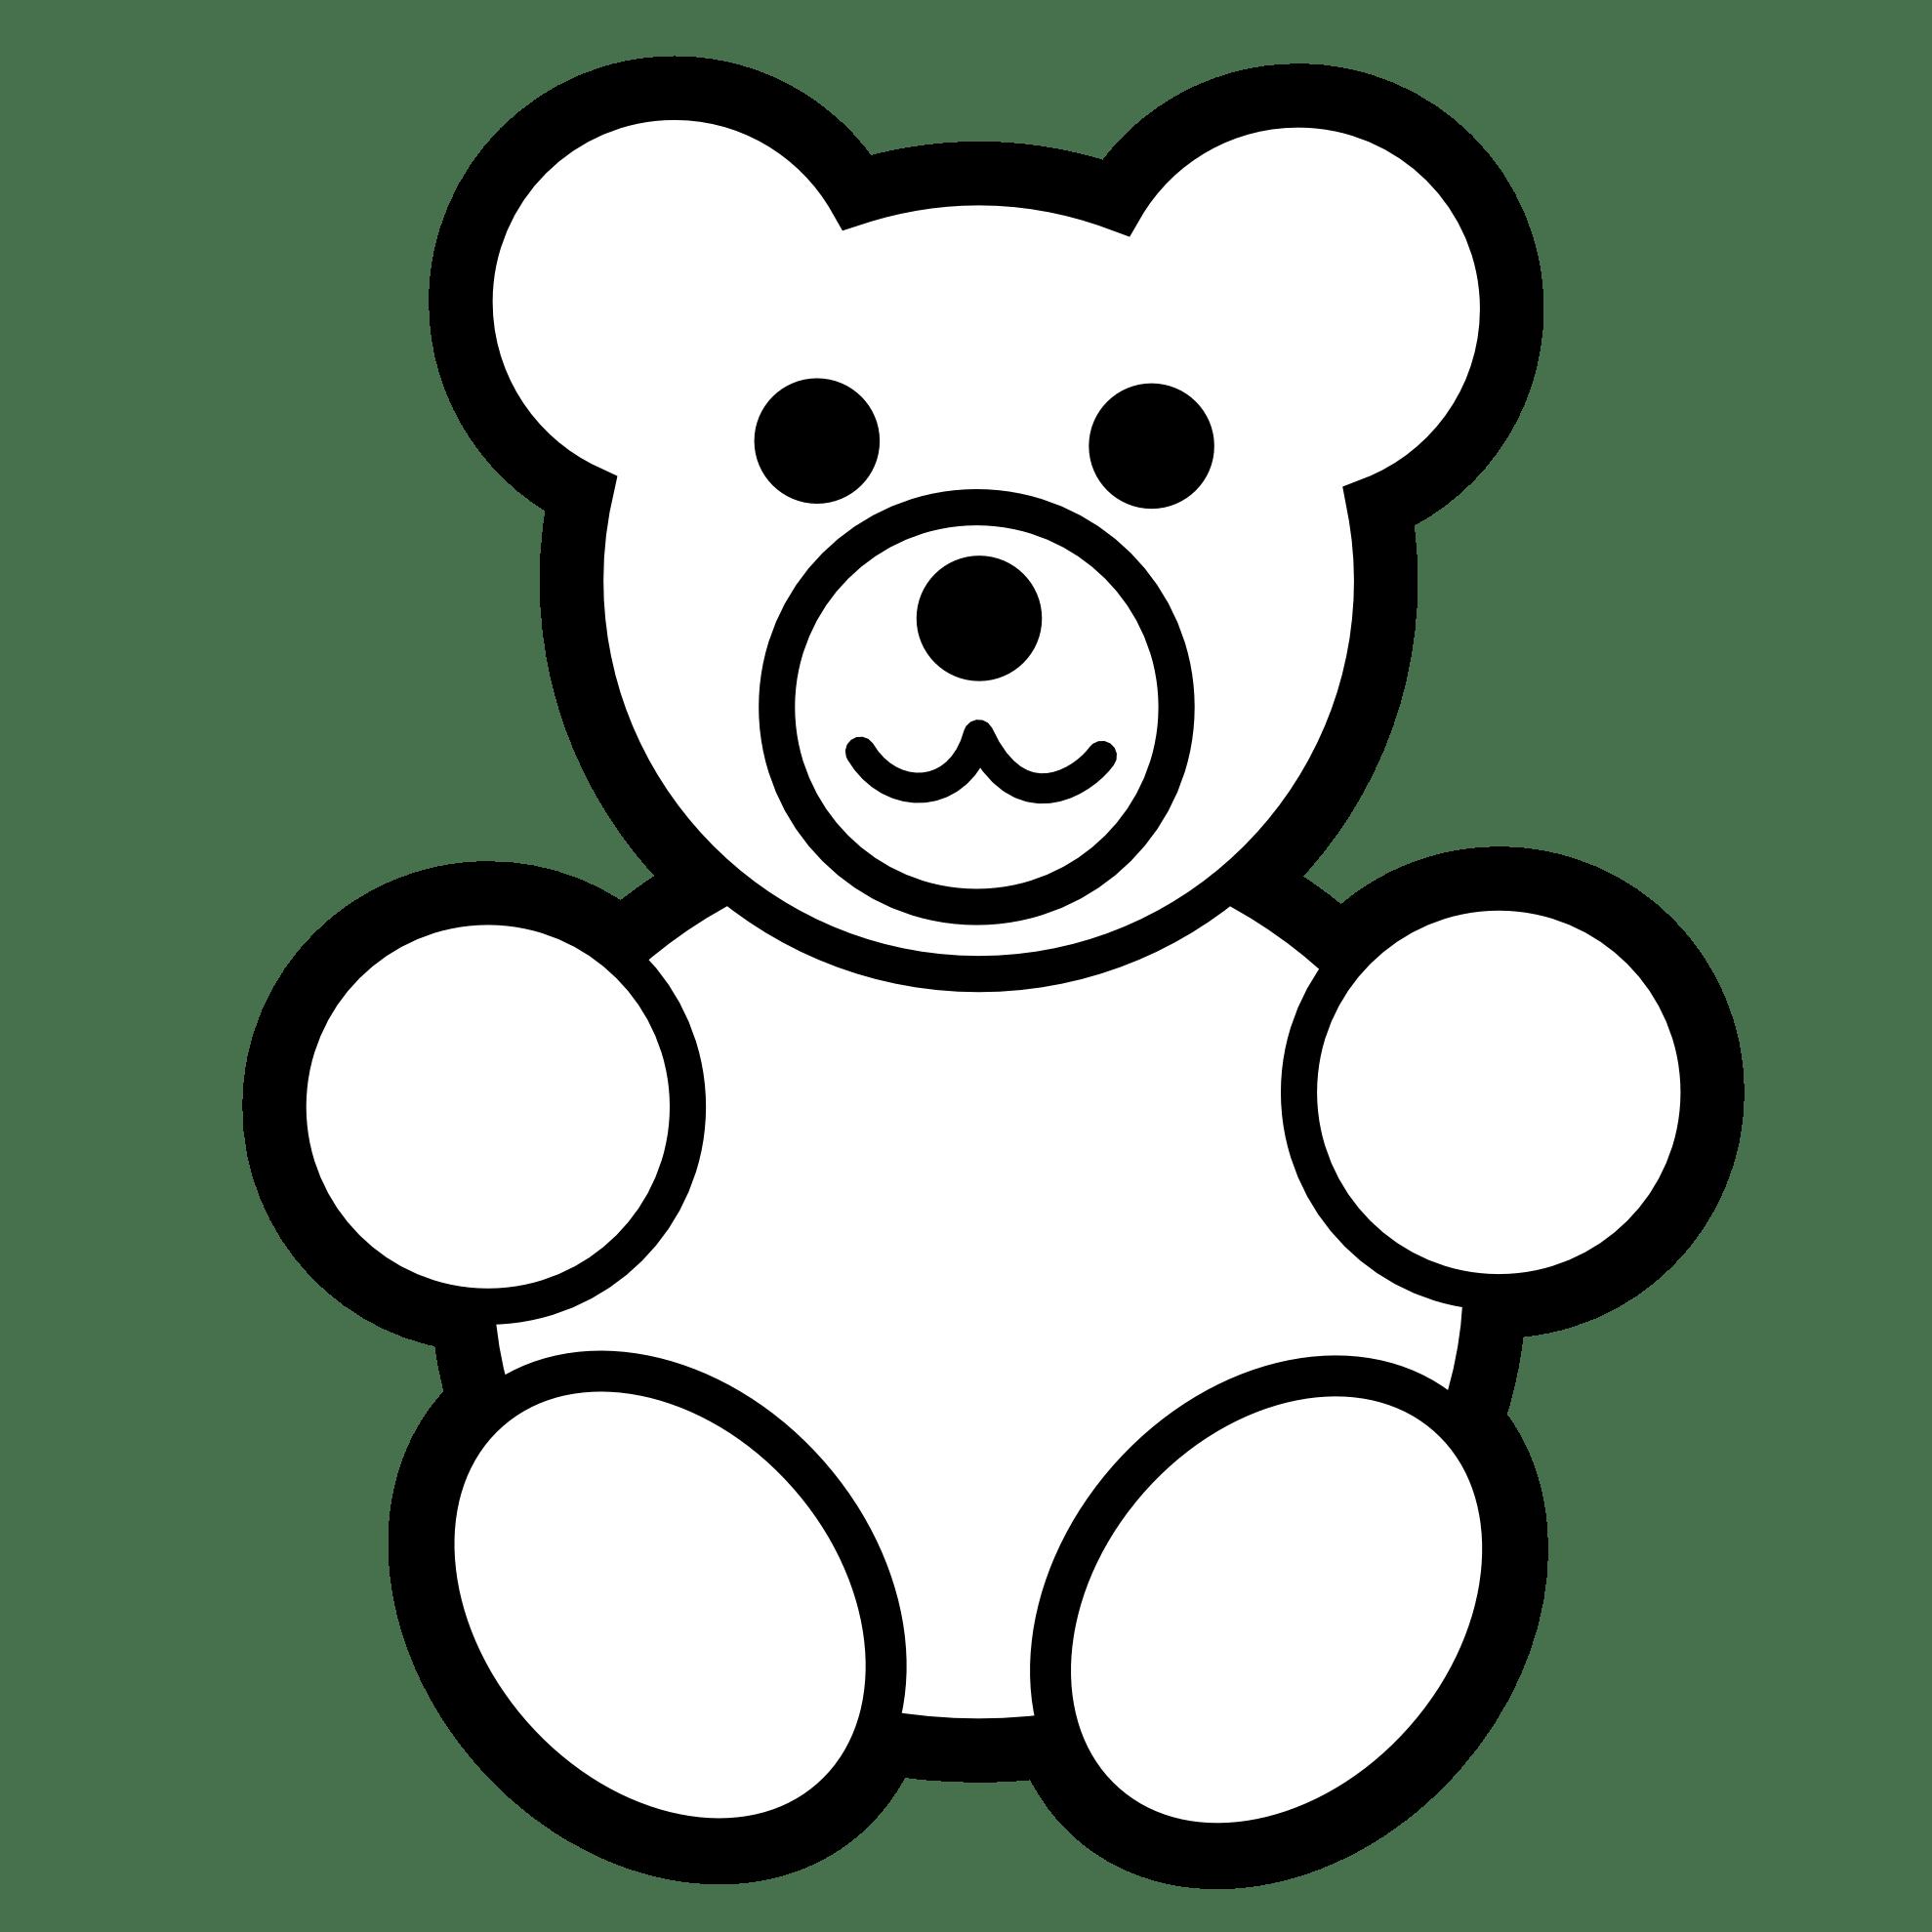 Bear Clip Art Black And White